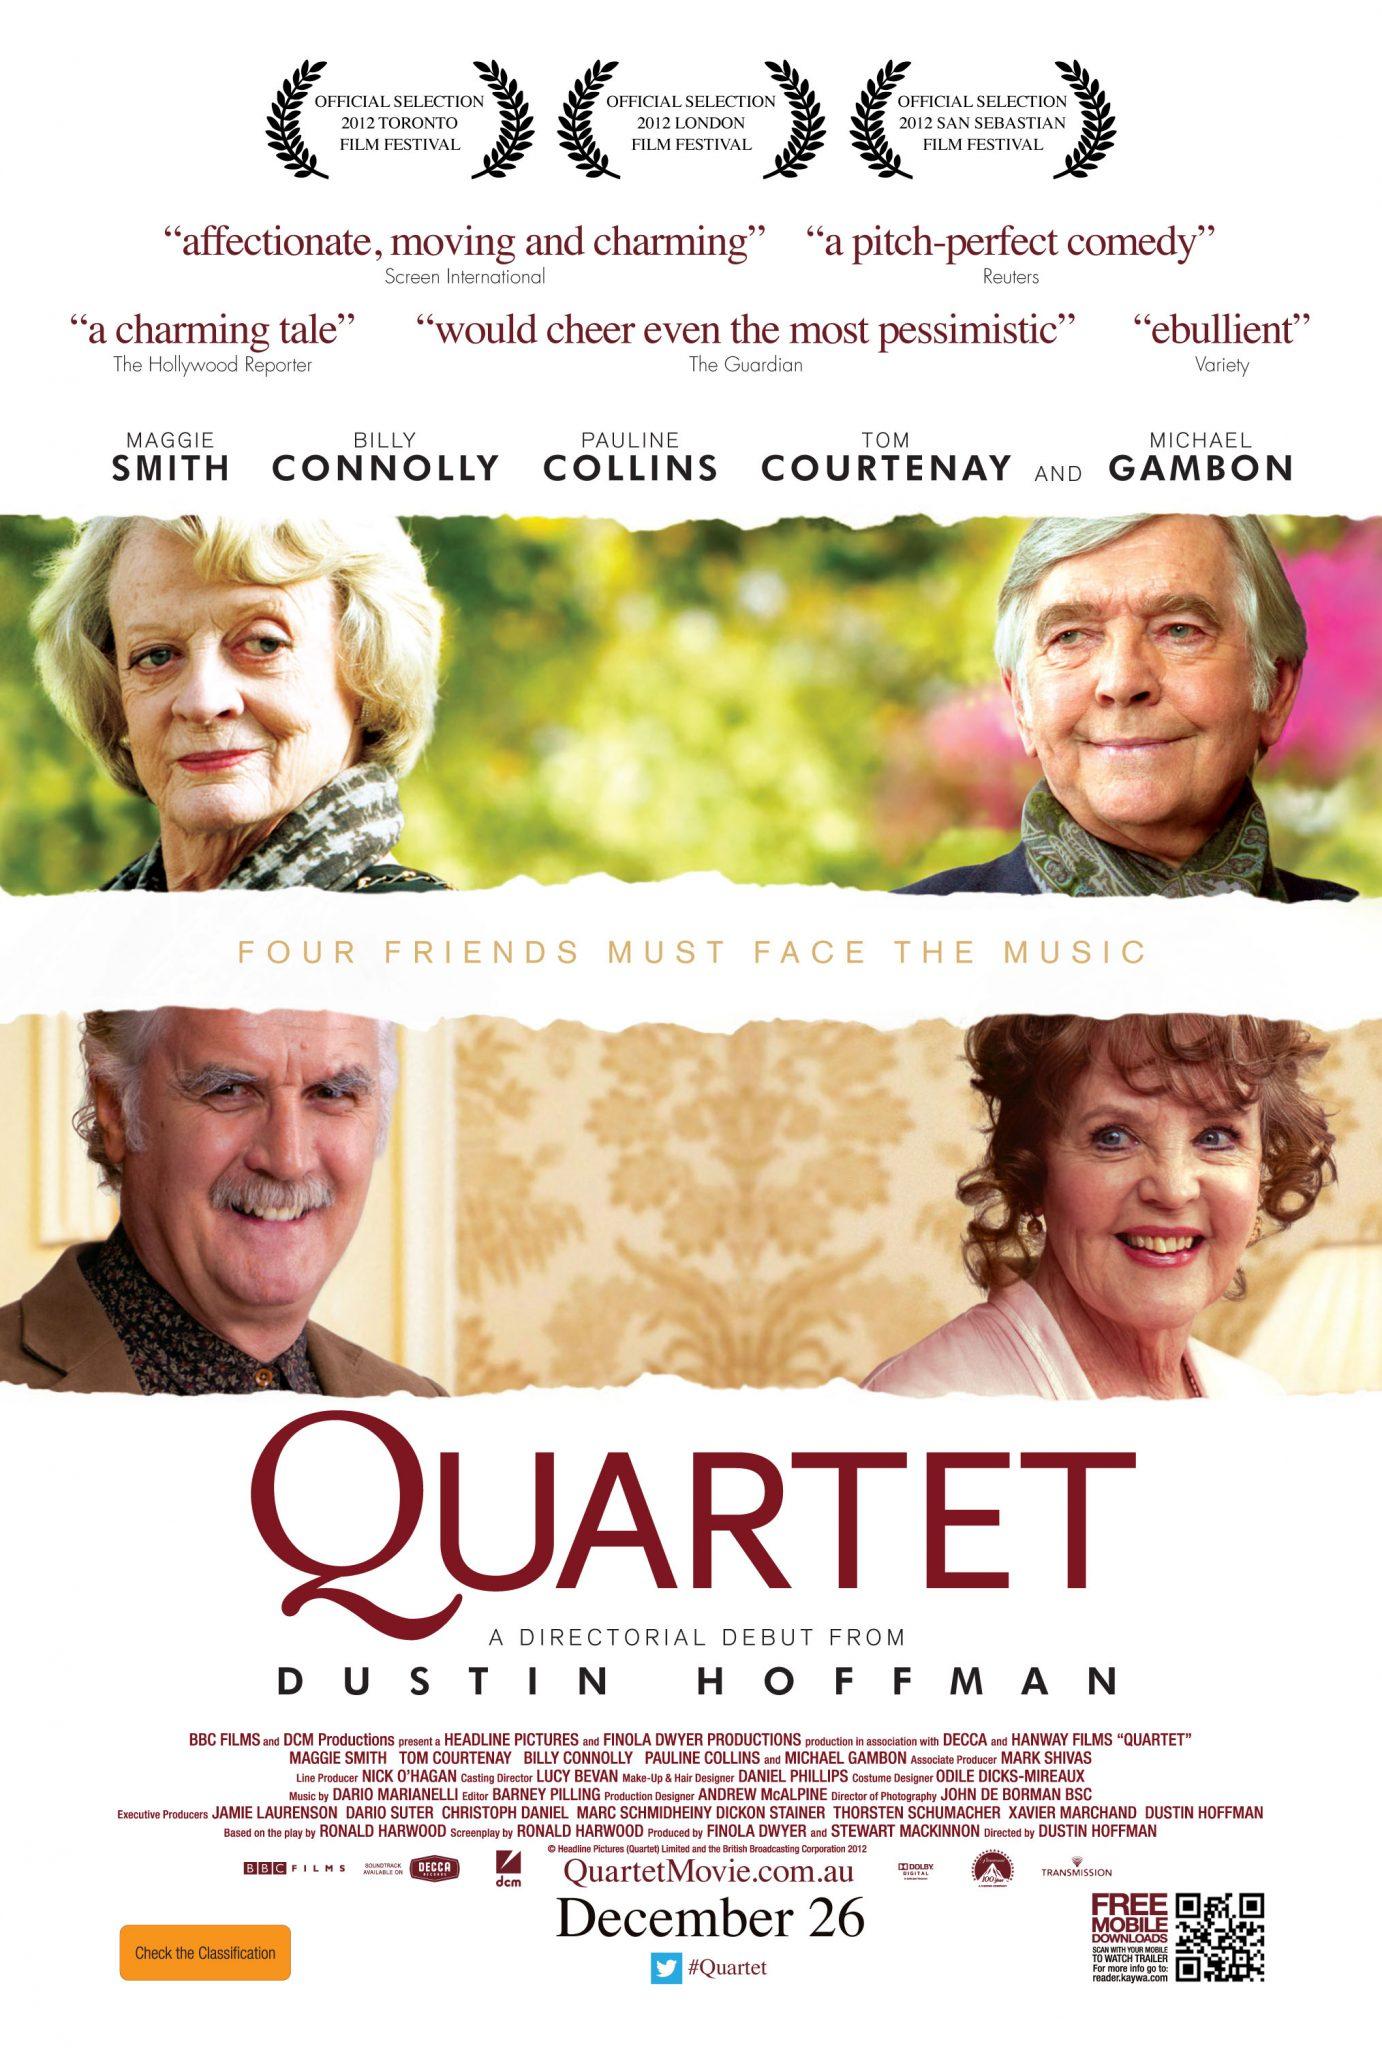 Film Review: Quartet (2012) – Film Blerg